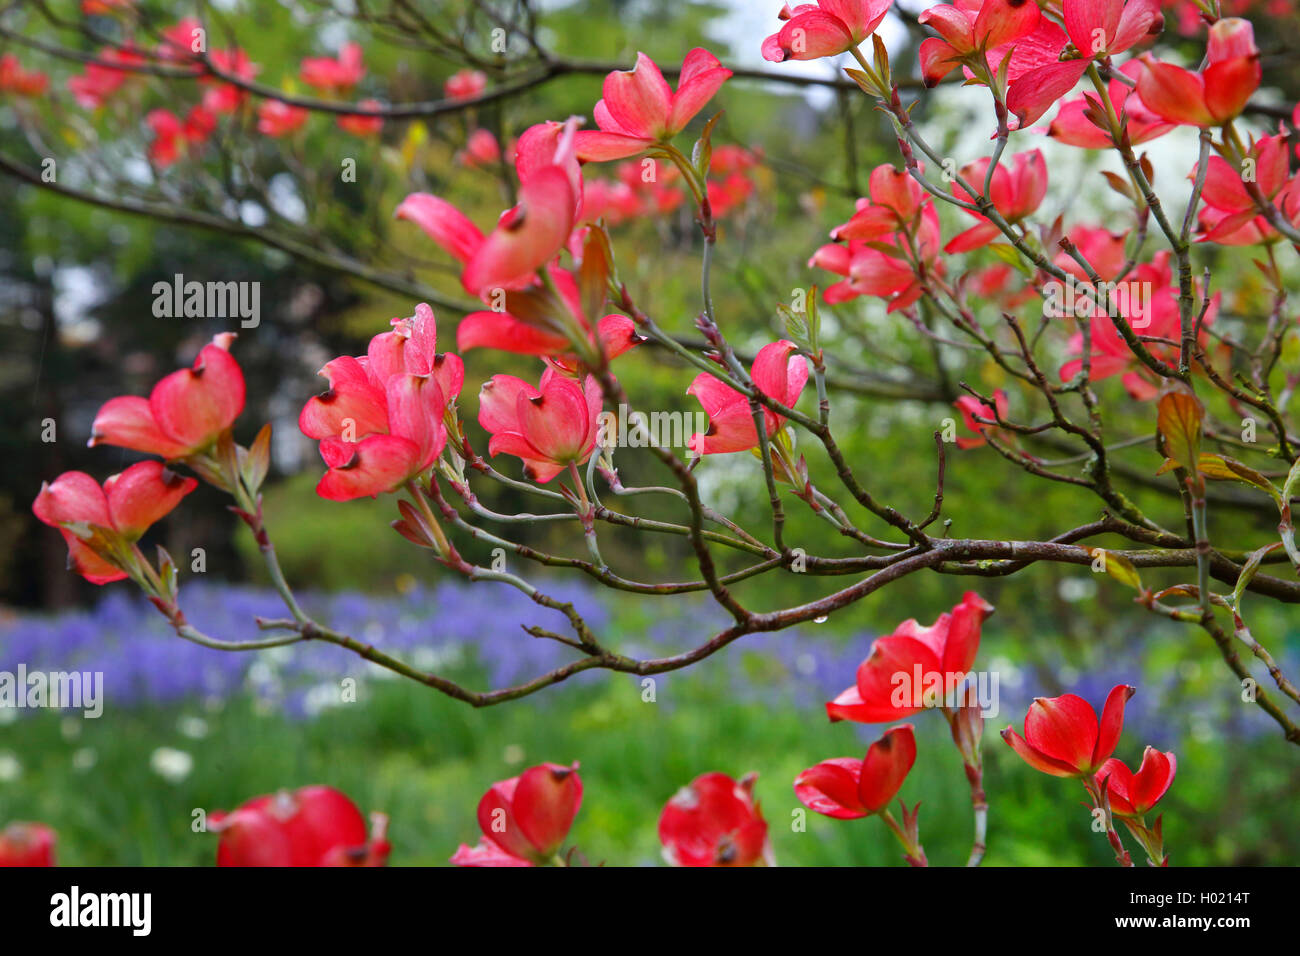 Blumenhartriegel Blumen Hartriegel Amerikanischer Blumenhartriegel